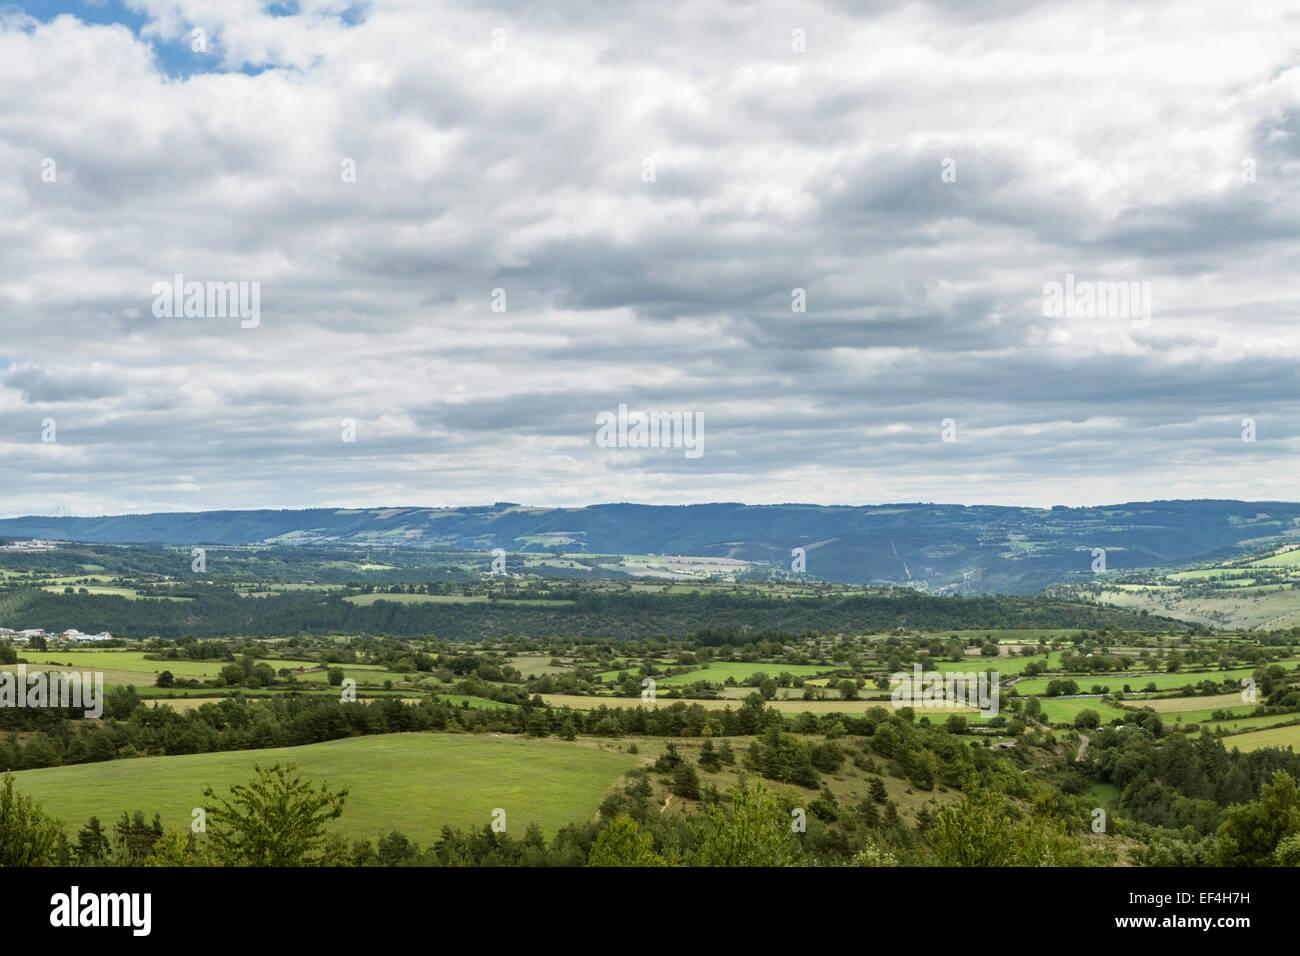 auvergne france landscape - Stock Image